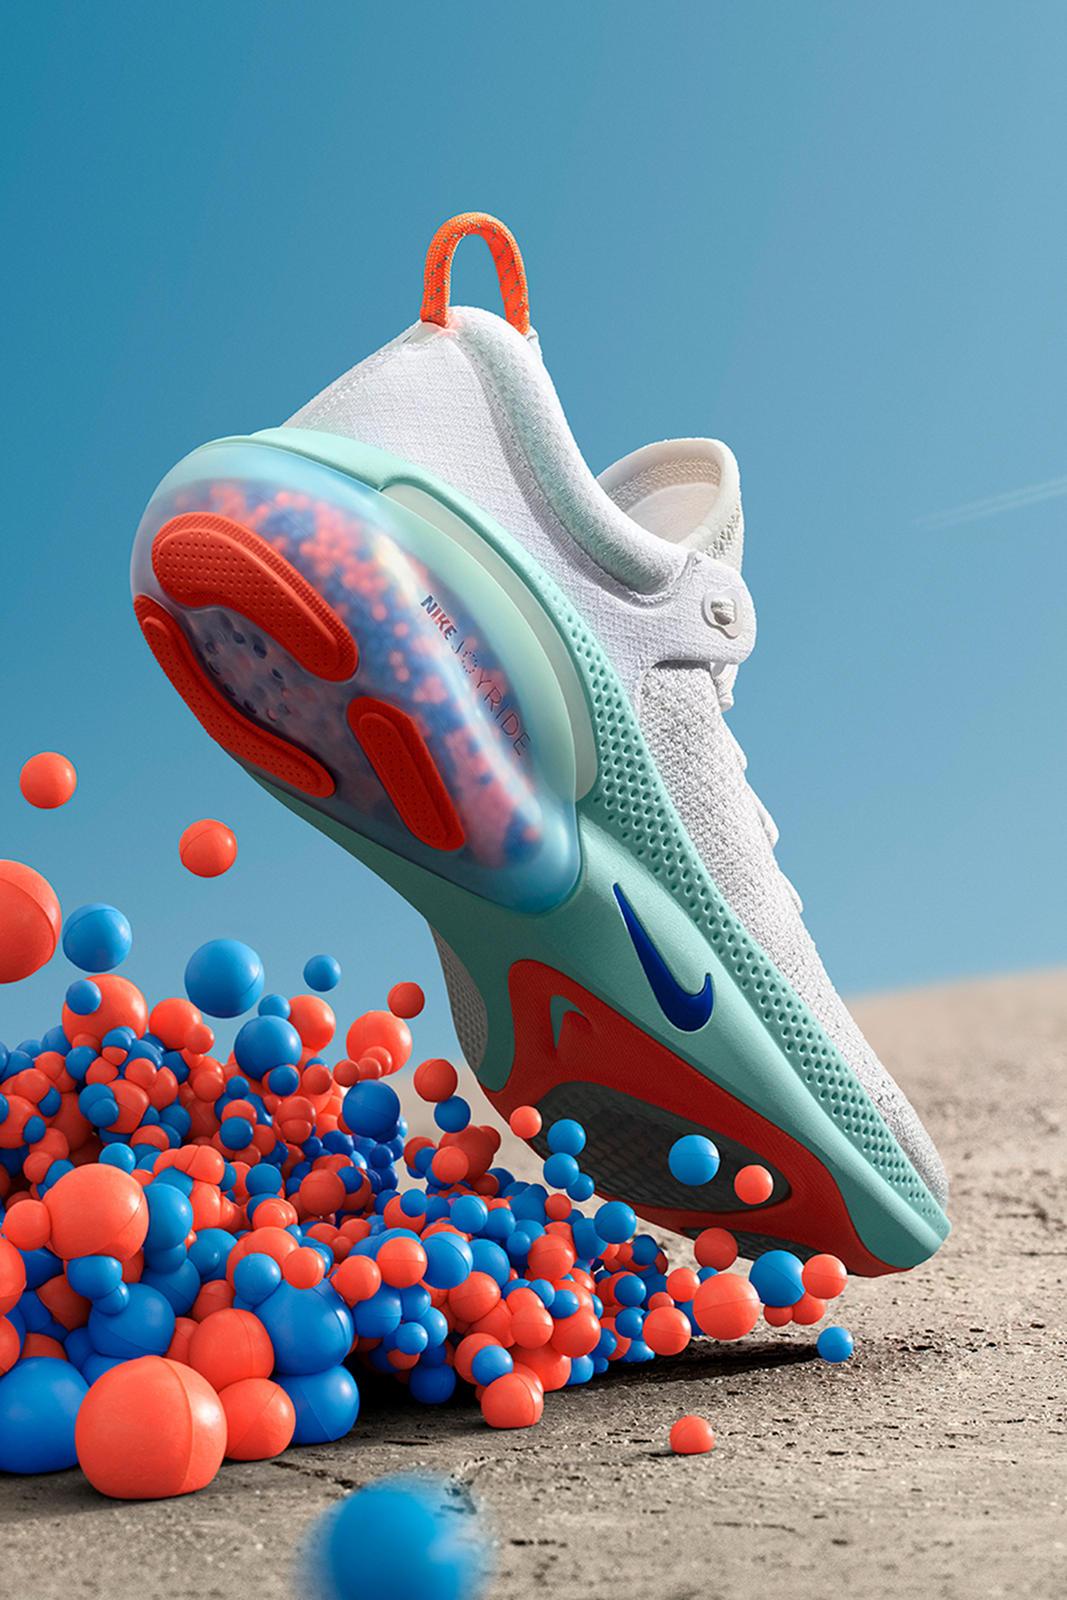 Nike Joyride Cushioning Innovation and Nike Joyride Flyknit Run Official Images 7